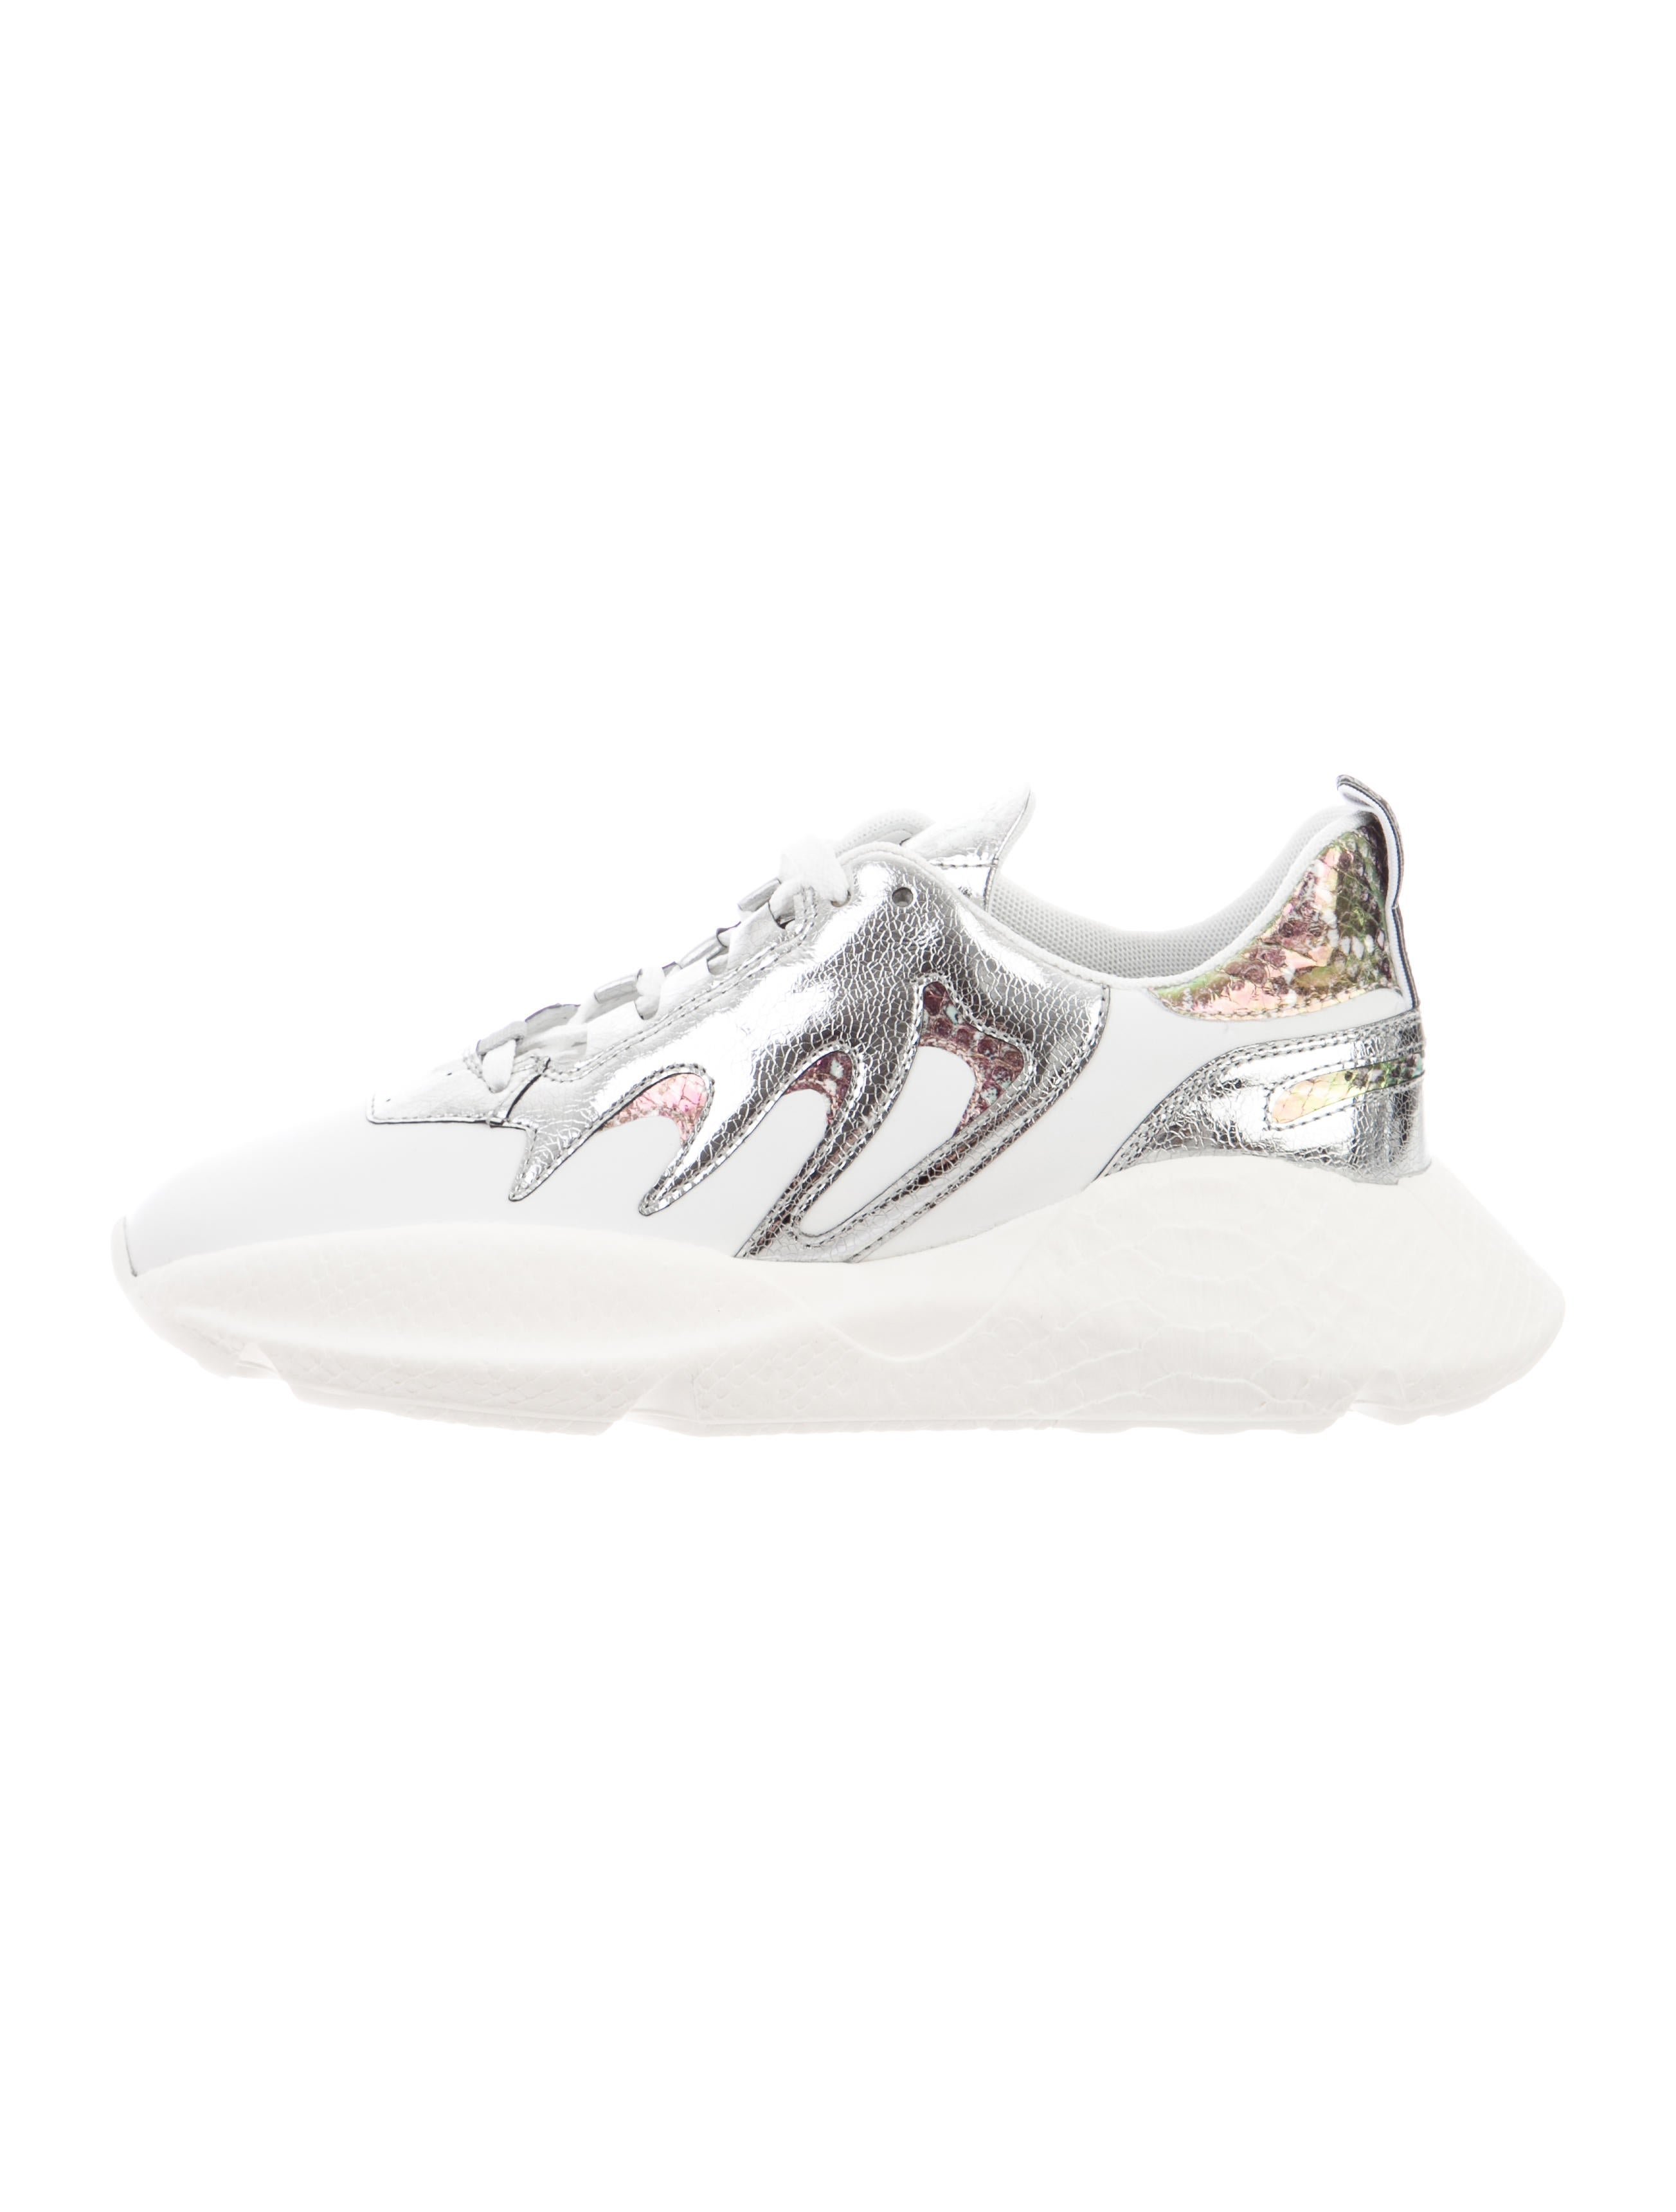 Roberto Cavalli Viper Sneakers w/ Tags